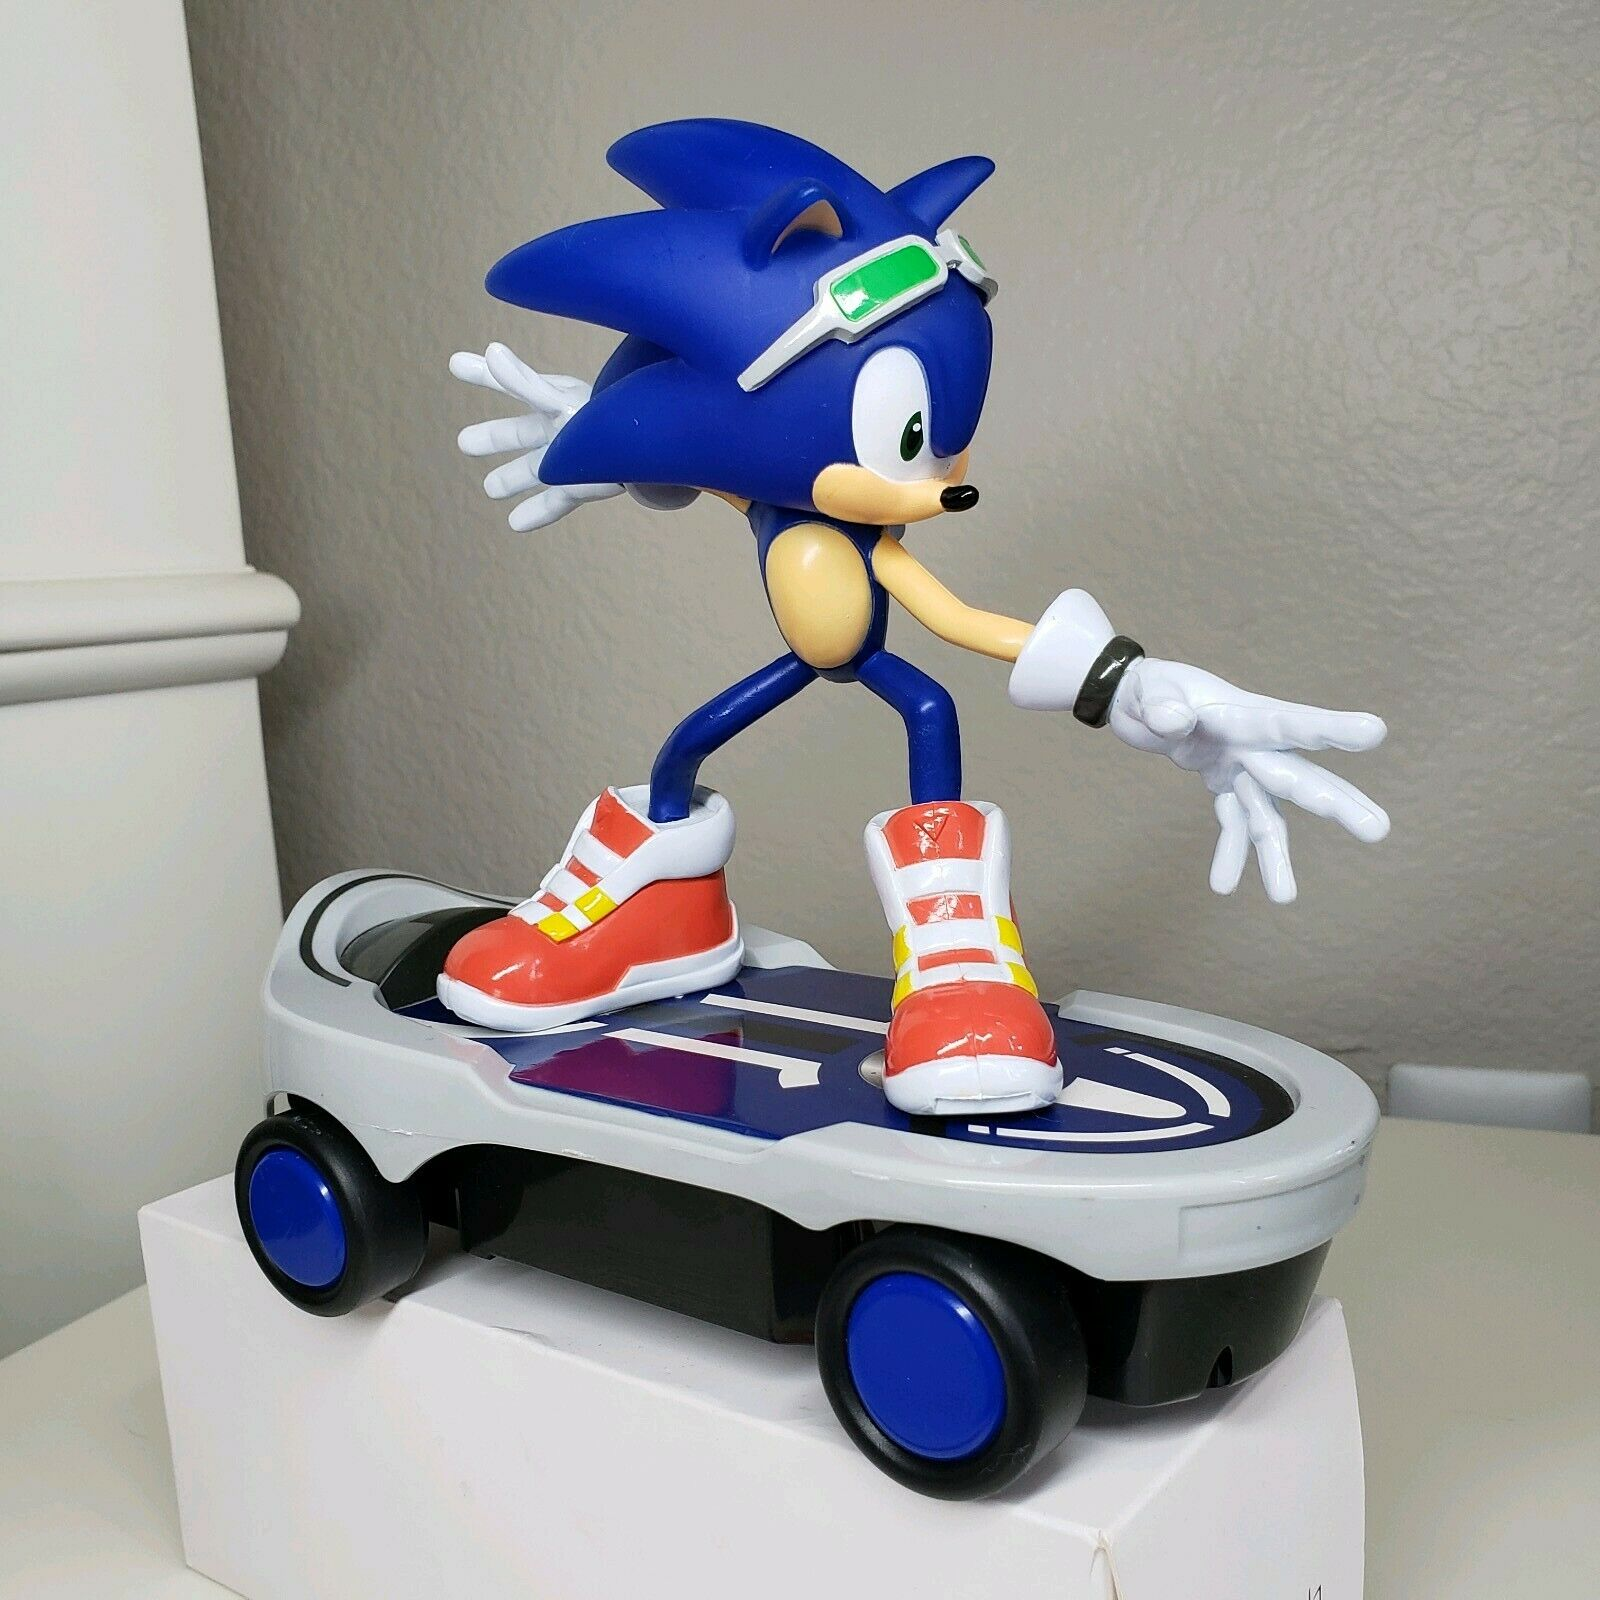 NKOK Sonic Free Rider R C Sega Sonic The Hedgehog